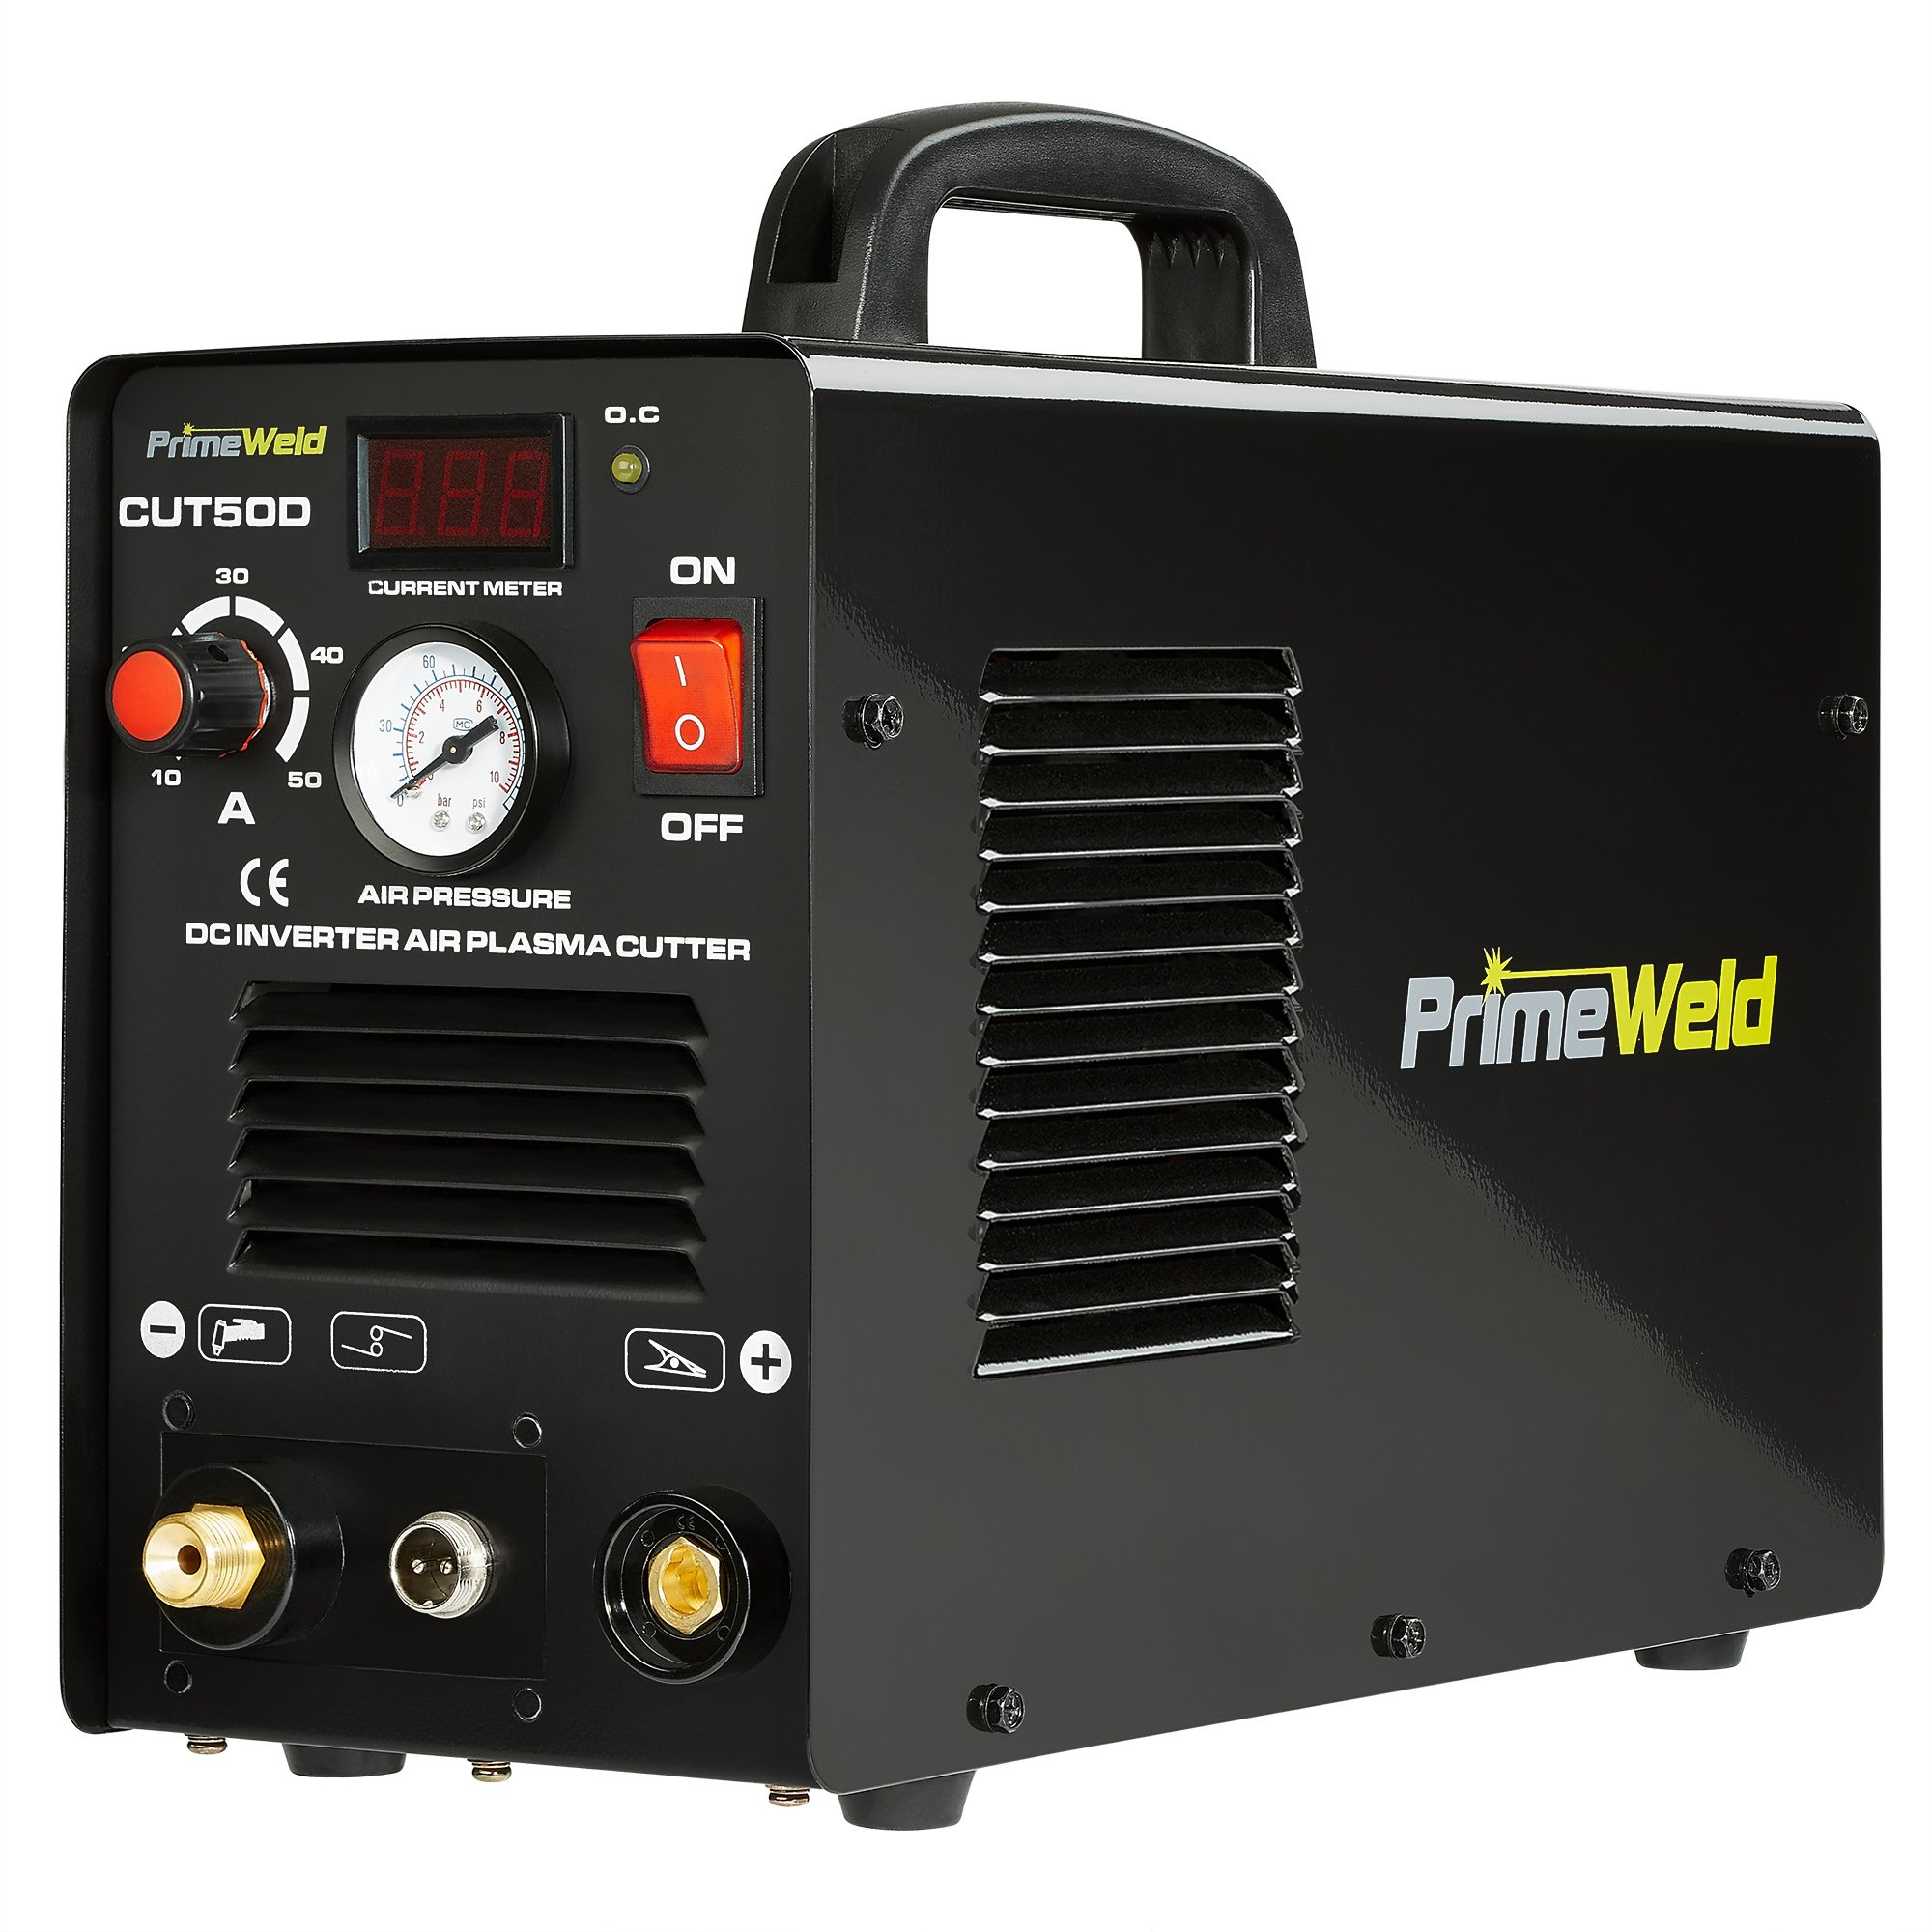 PRIMEWELD Premium & Rugged 50A Air Inverter Plasma Cutter Automatic Dual Voltage 110/220VAC 1/2'' Clean Cut Portable by PRIMEWELD